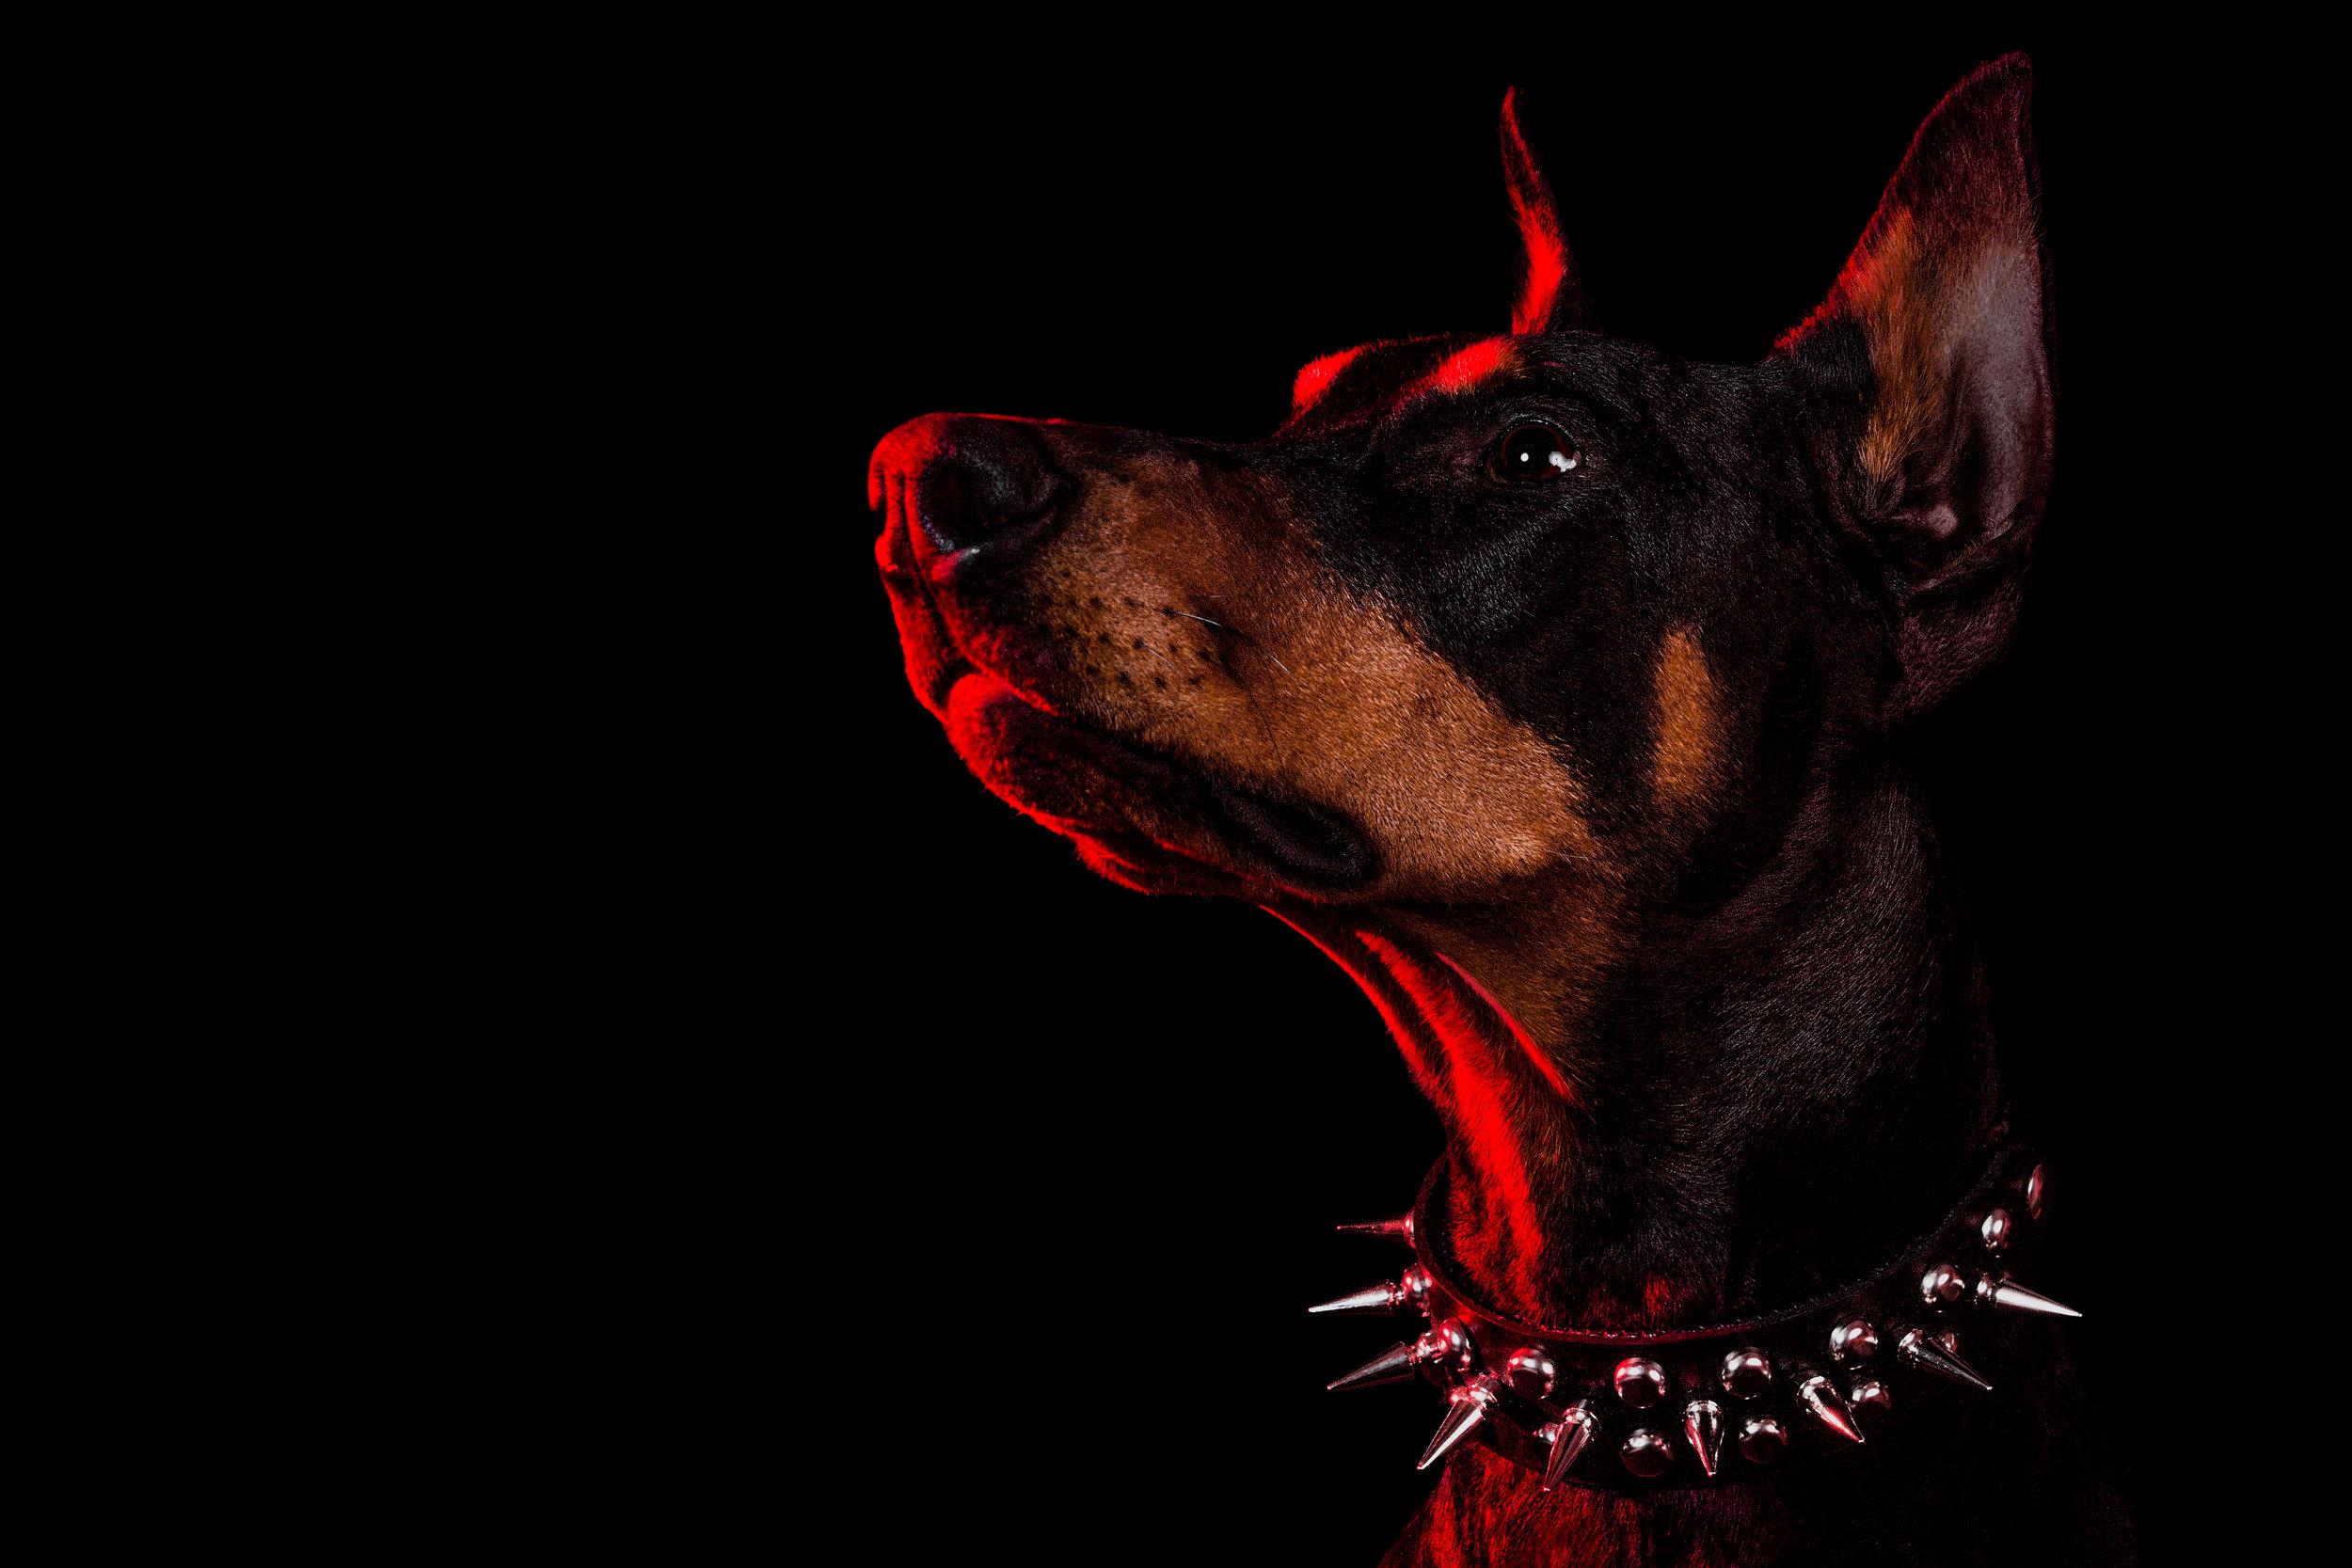 Photograph of a Doberman Dog by Toronto Pet Photographer Brent D'Silva. Brampton, ON.